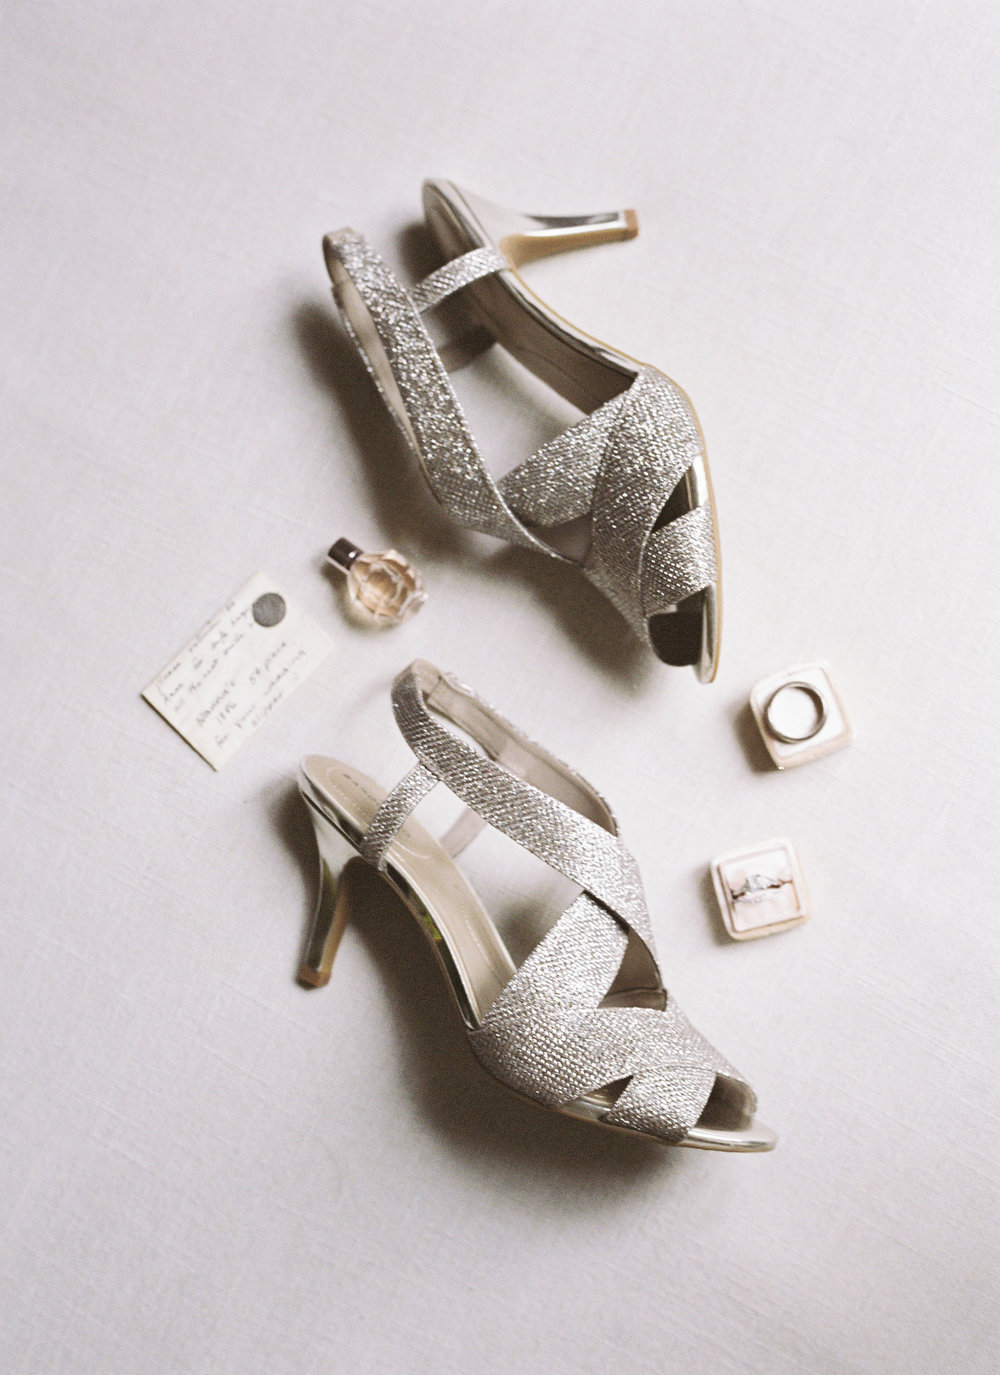 Jacqueline Anne Photography  - M&B Wedding - 081818-8.jpg